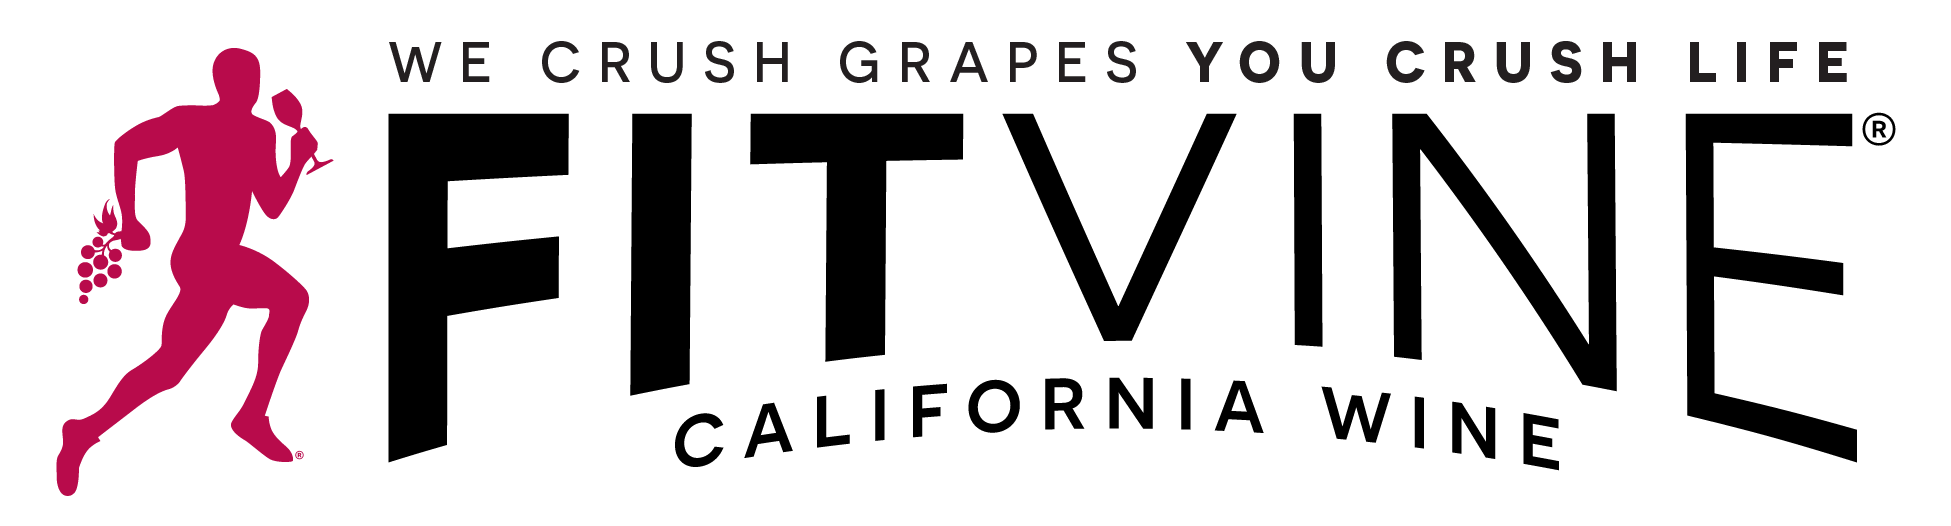 FitVine Wine - We Crush Grapes, You Crush Life